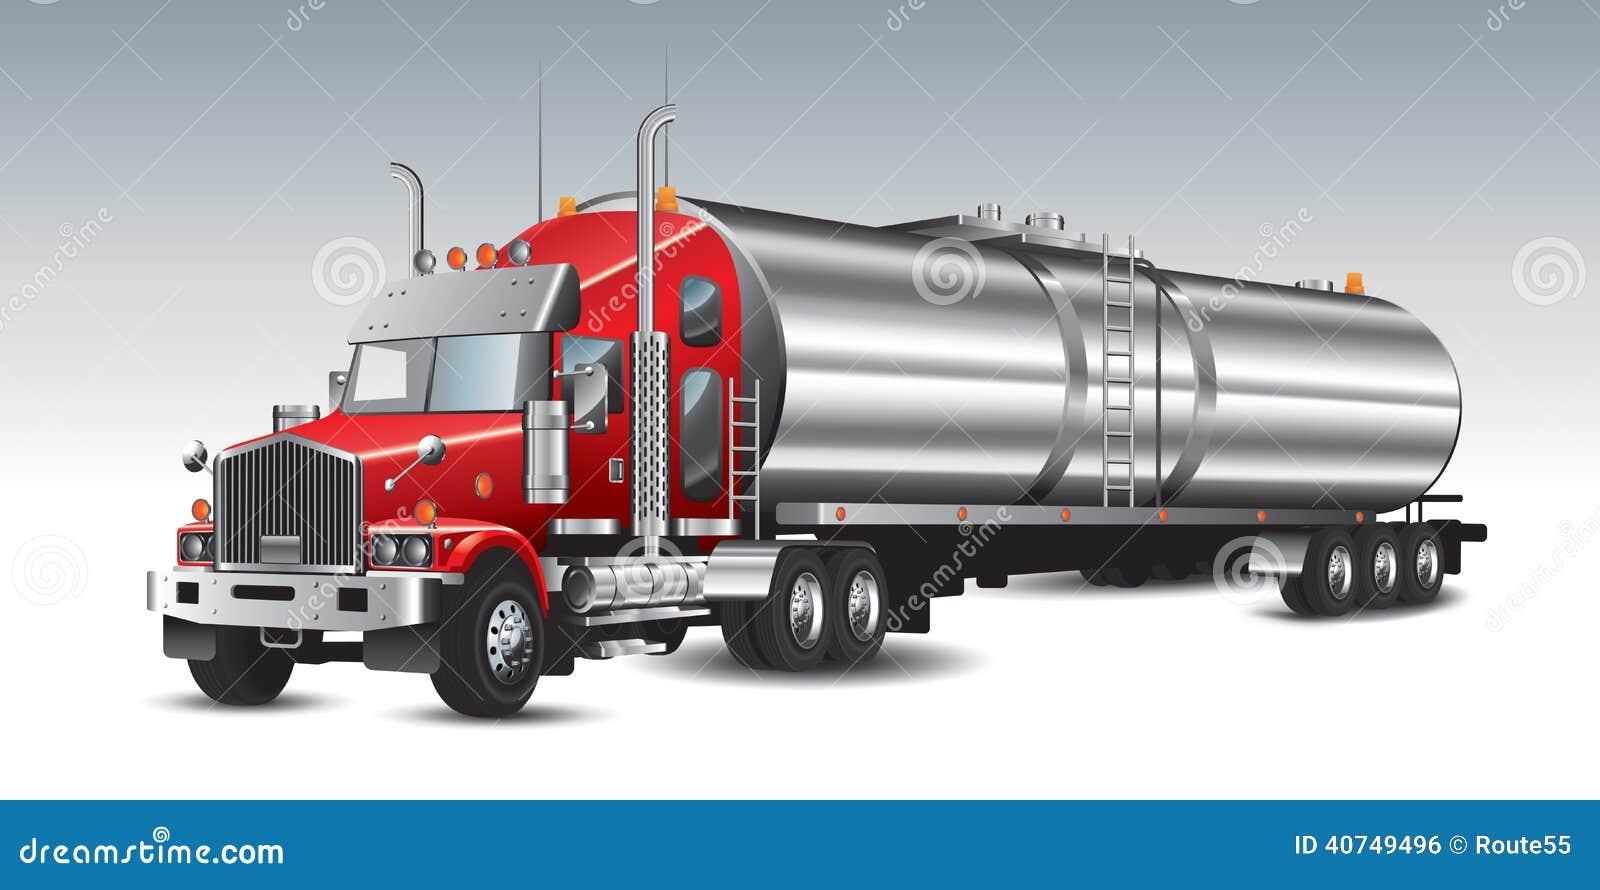 Cami 243 N De Petrolero Del Combustible Ilustraci 243 N Del Vector